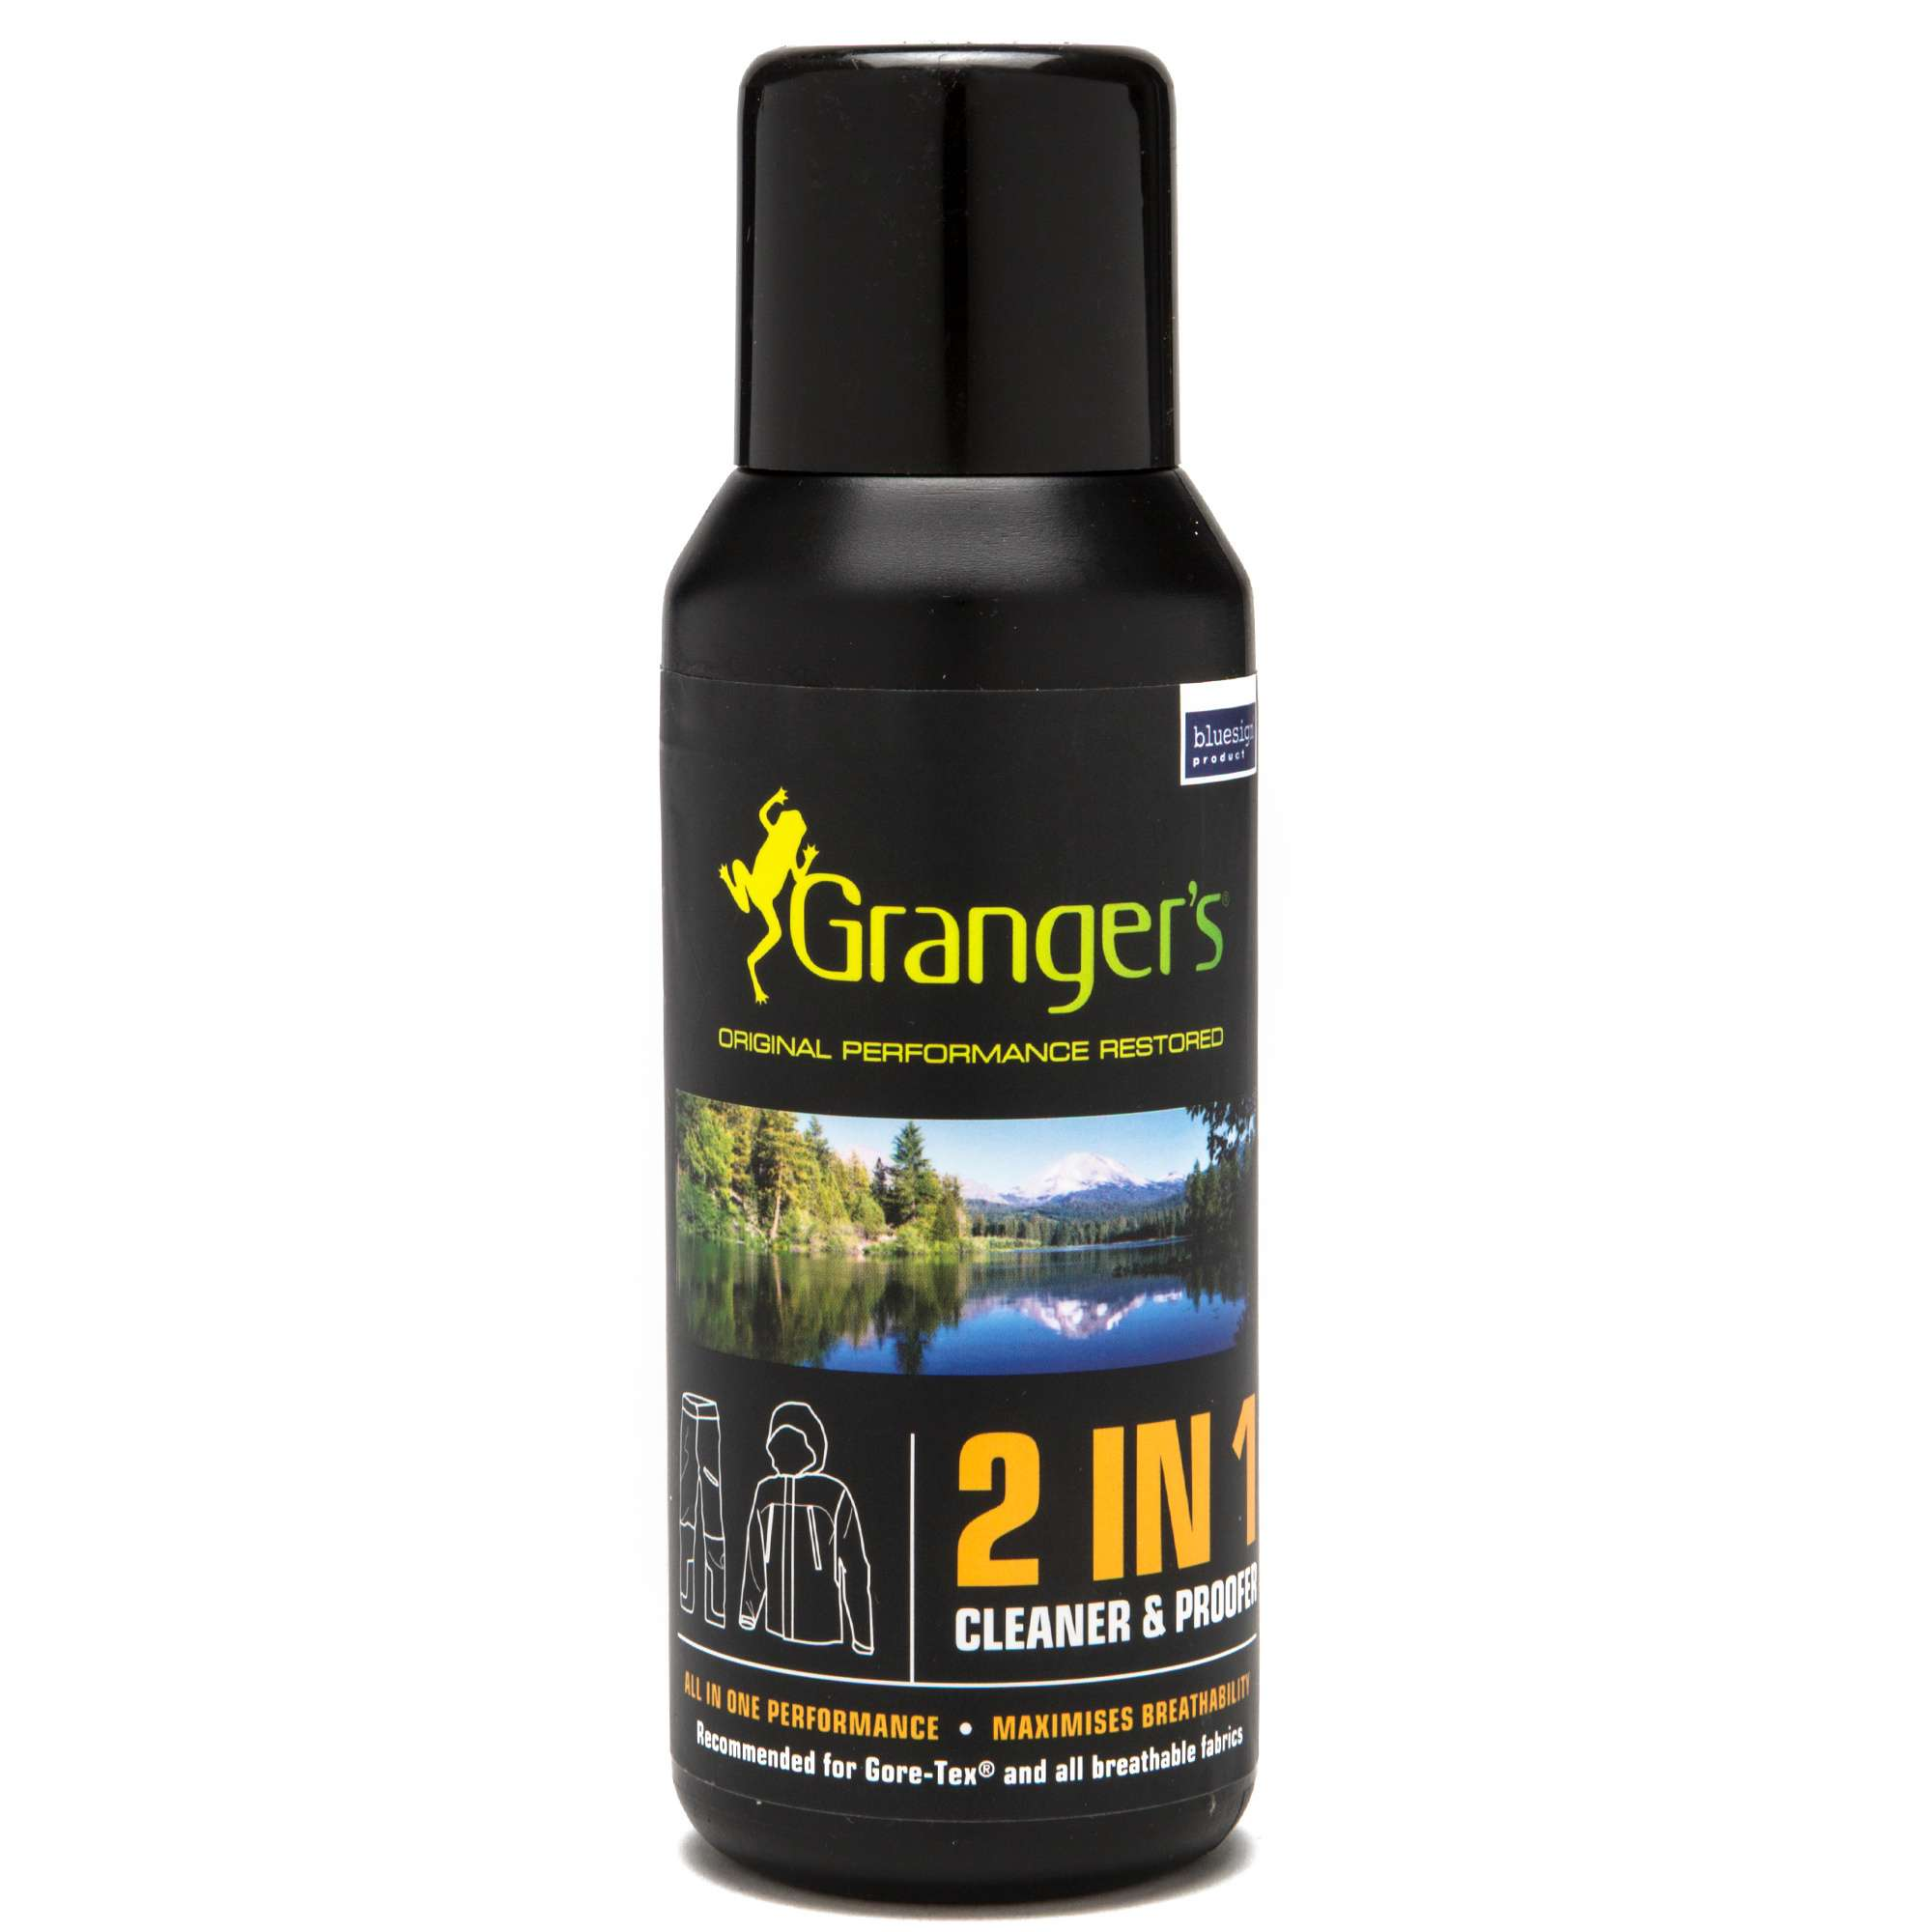 GRANGERS 2 in 1 Cleaner and Waterproofer